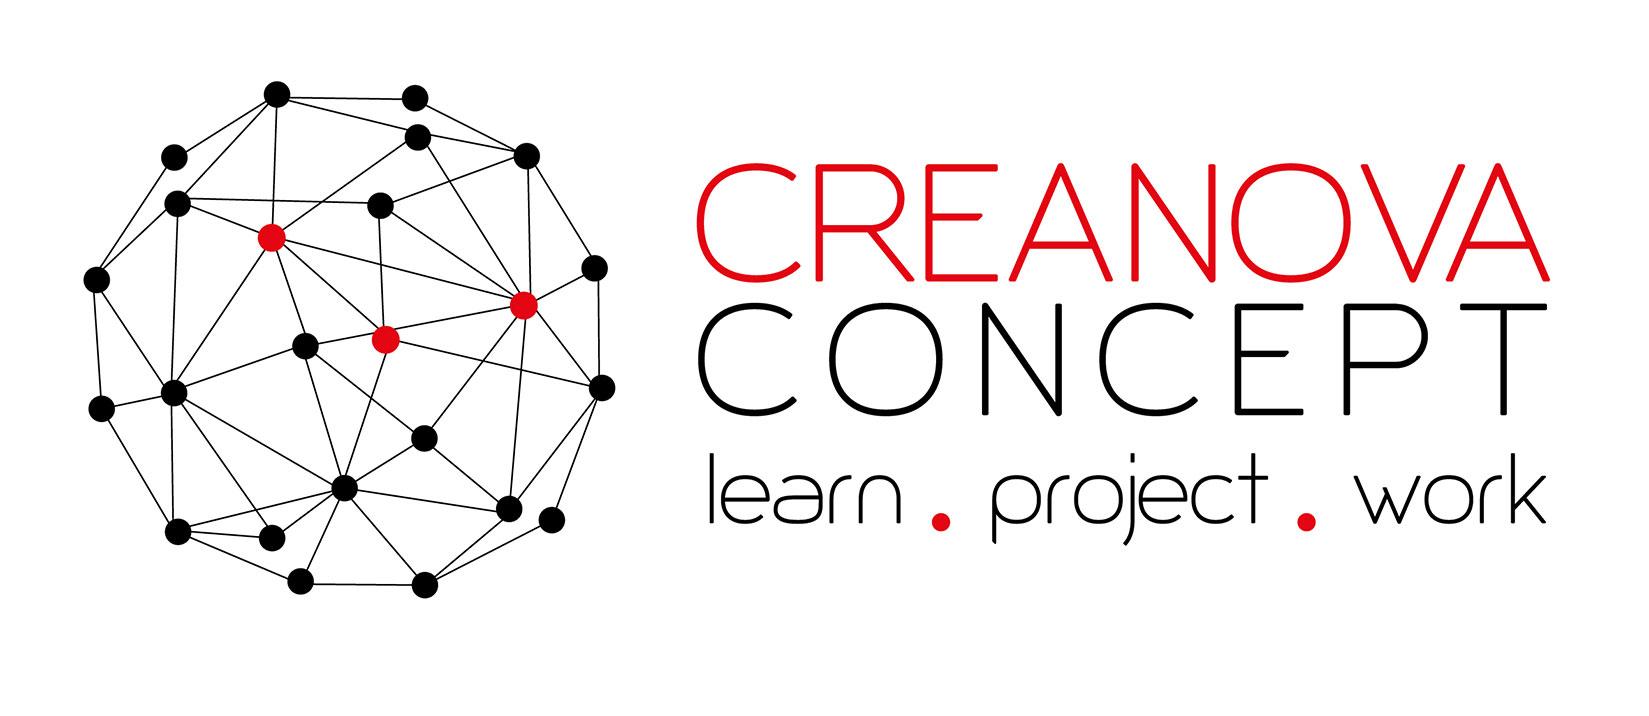 Diseño Logo: creación logotipo para CreaNova Concept. Manual de Identidad Corporativa.